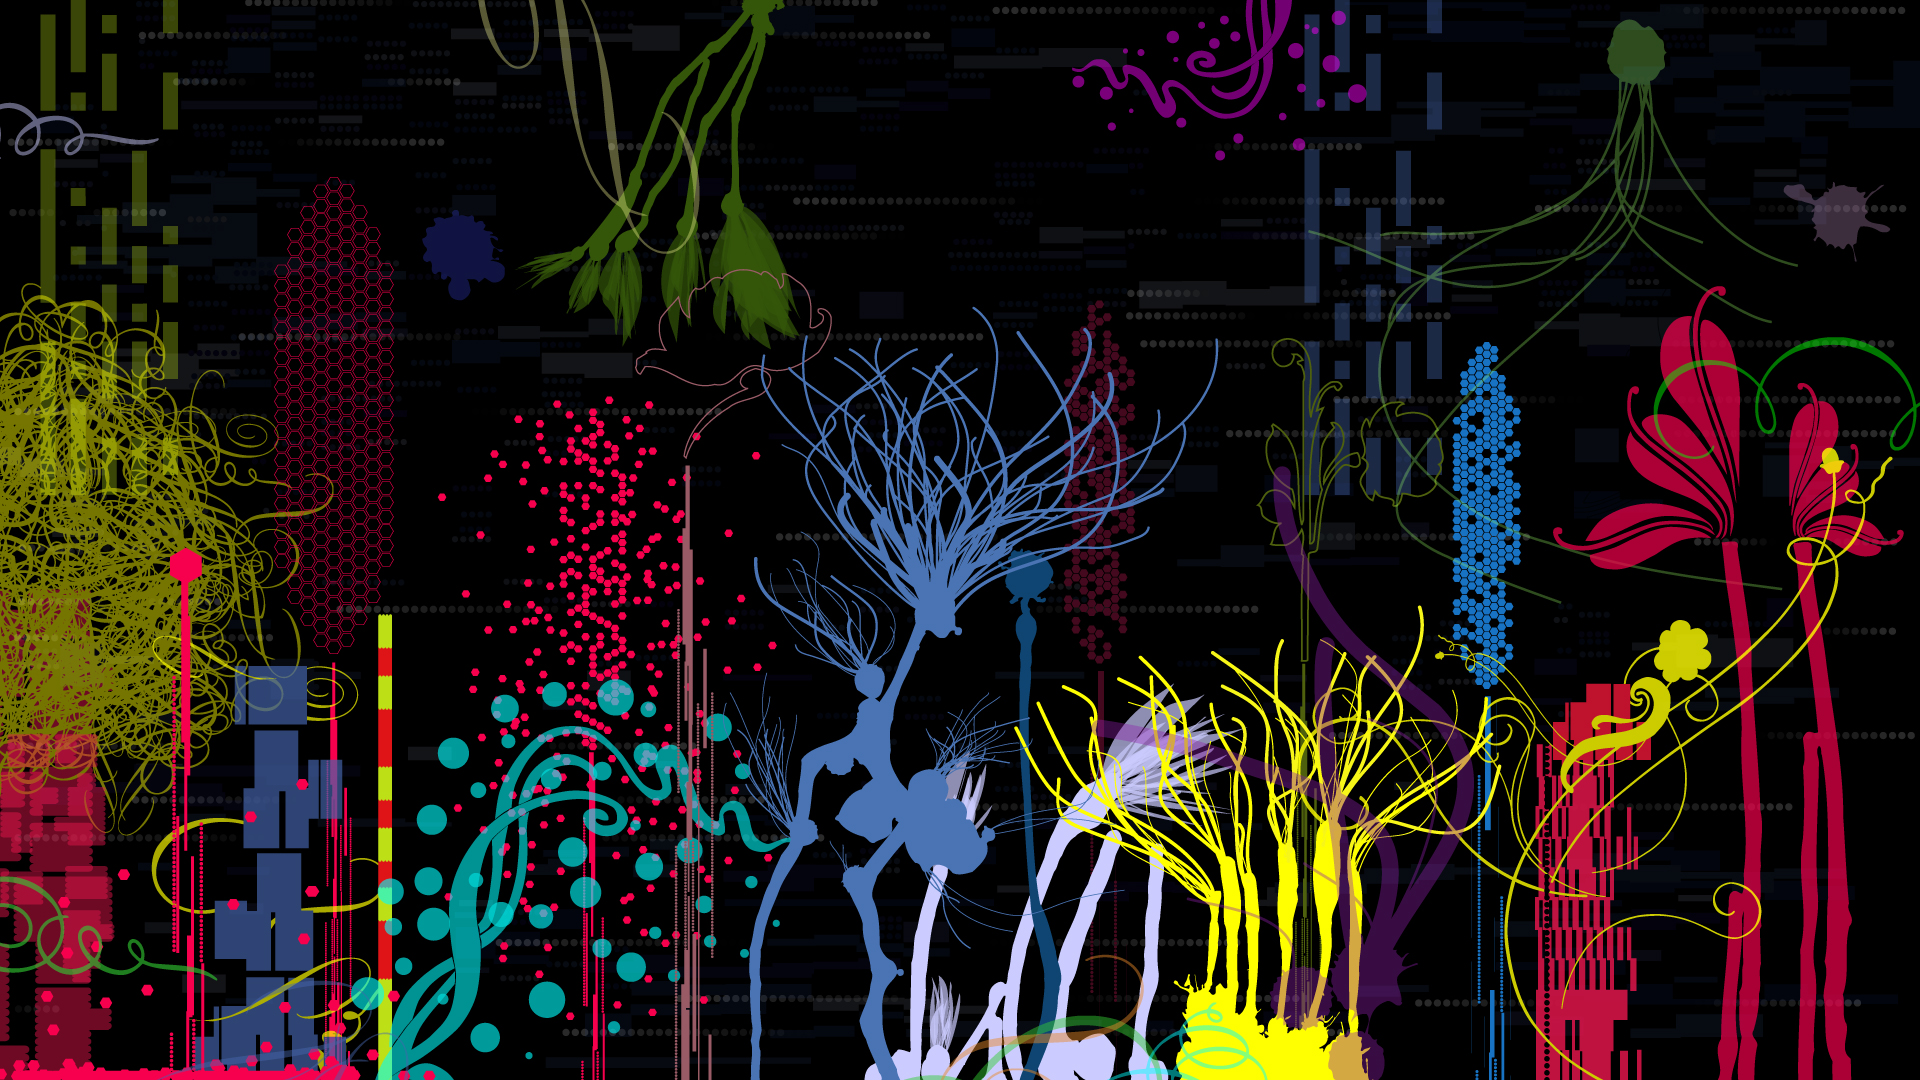 wallpaper pixeljunk amazing web background unique playstation 1920x1080